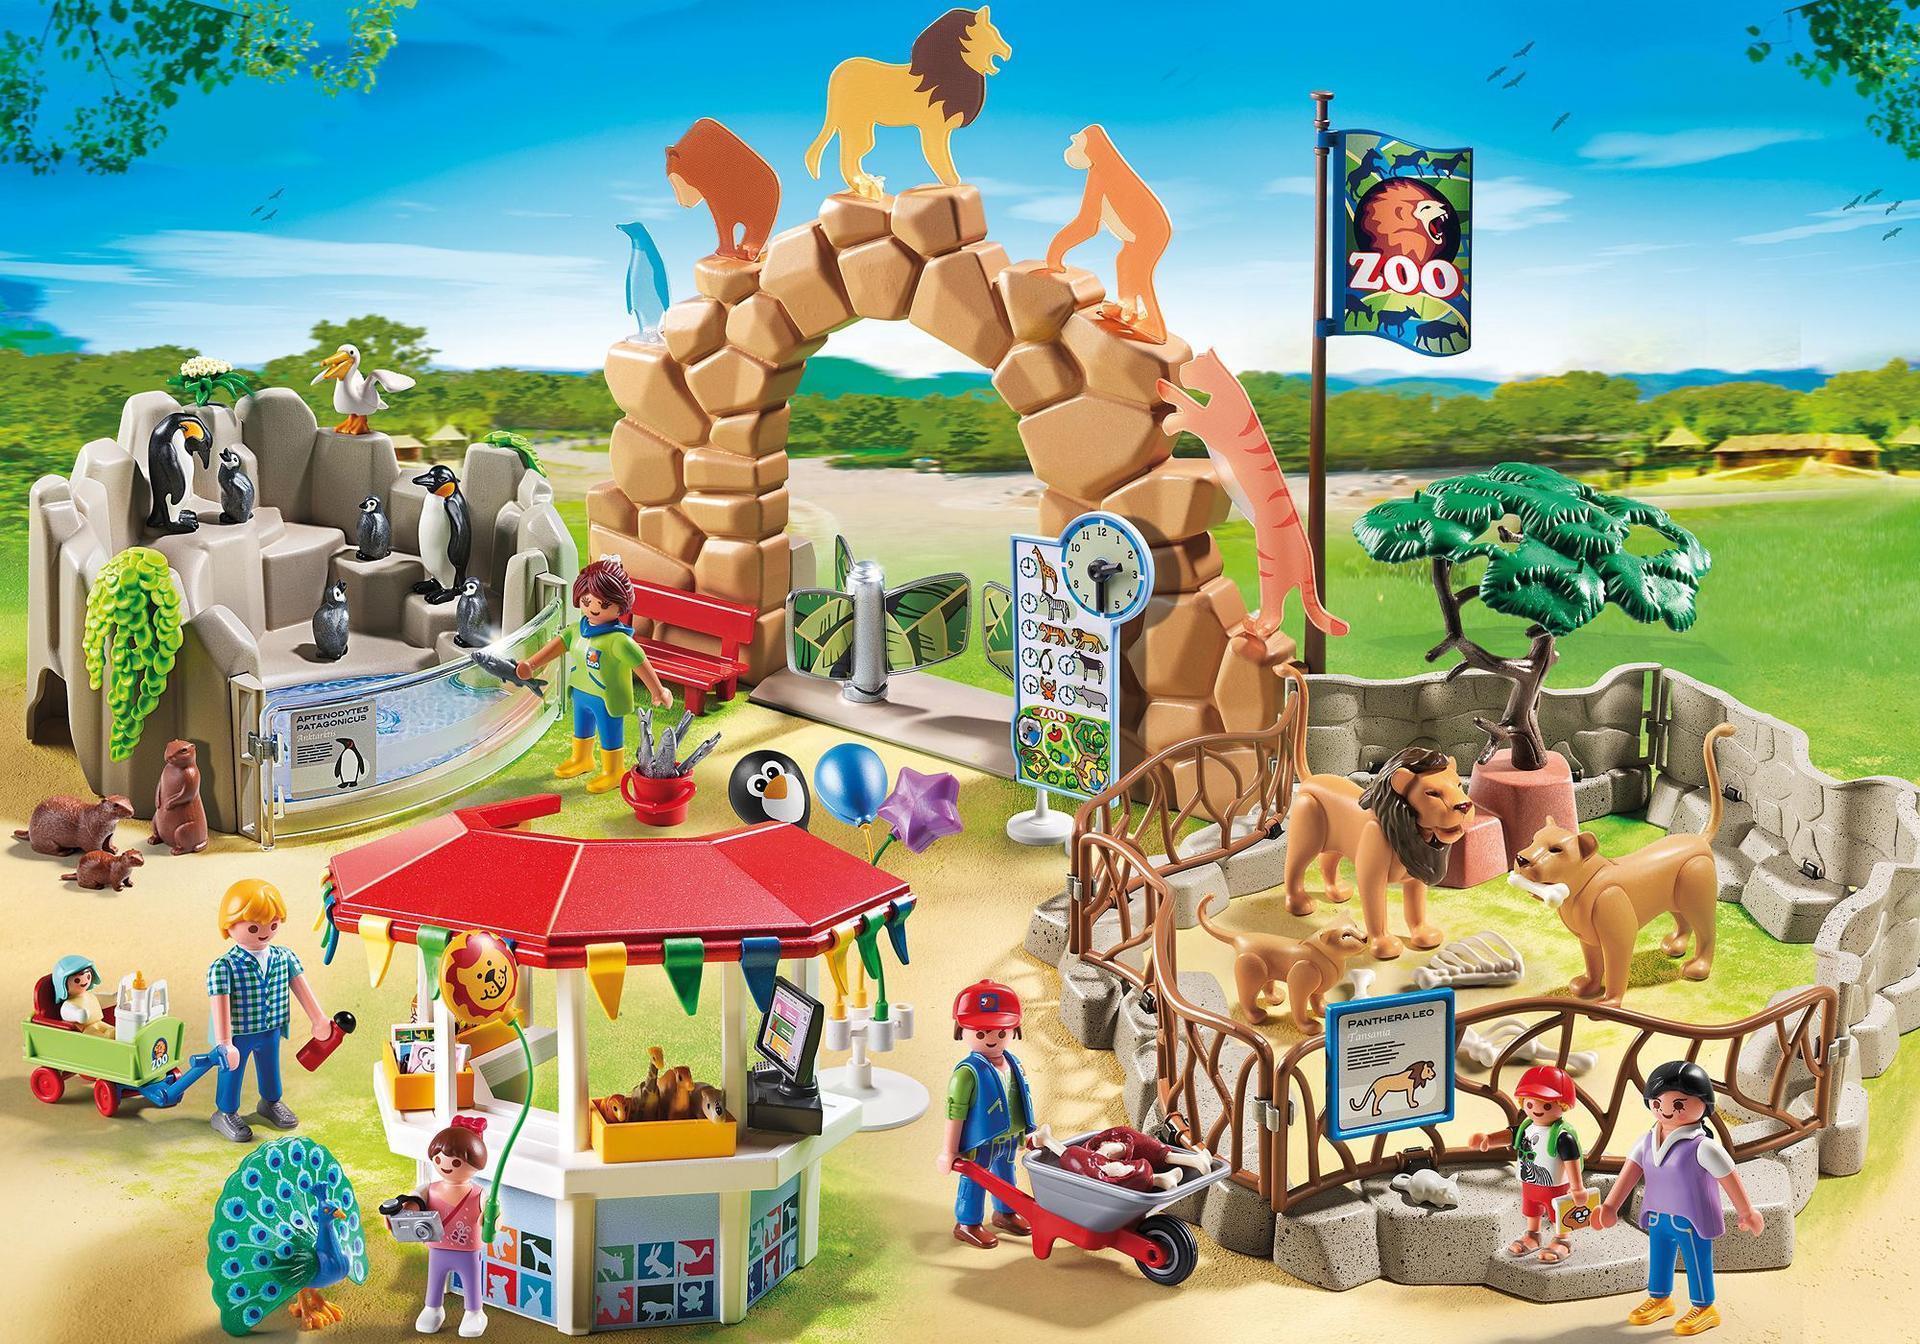 grand zoo 6634 playmobil france. Black Bedroom Furniture Sets. Home Design Ideas